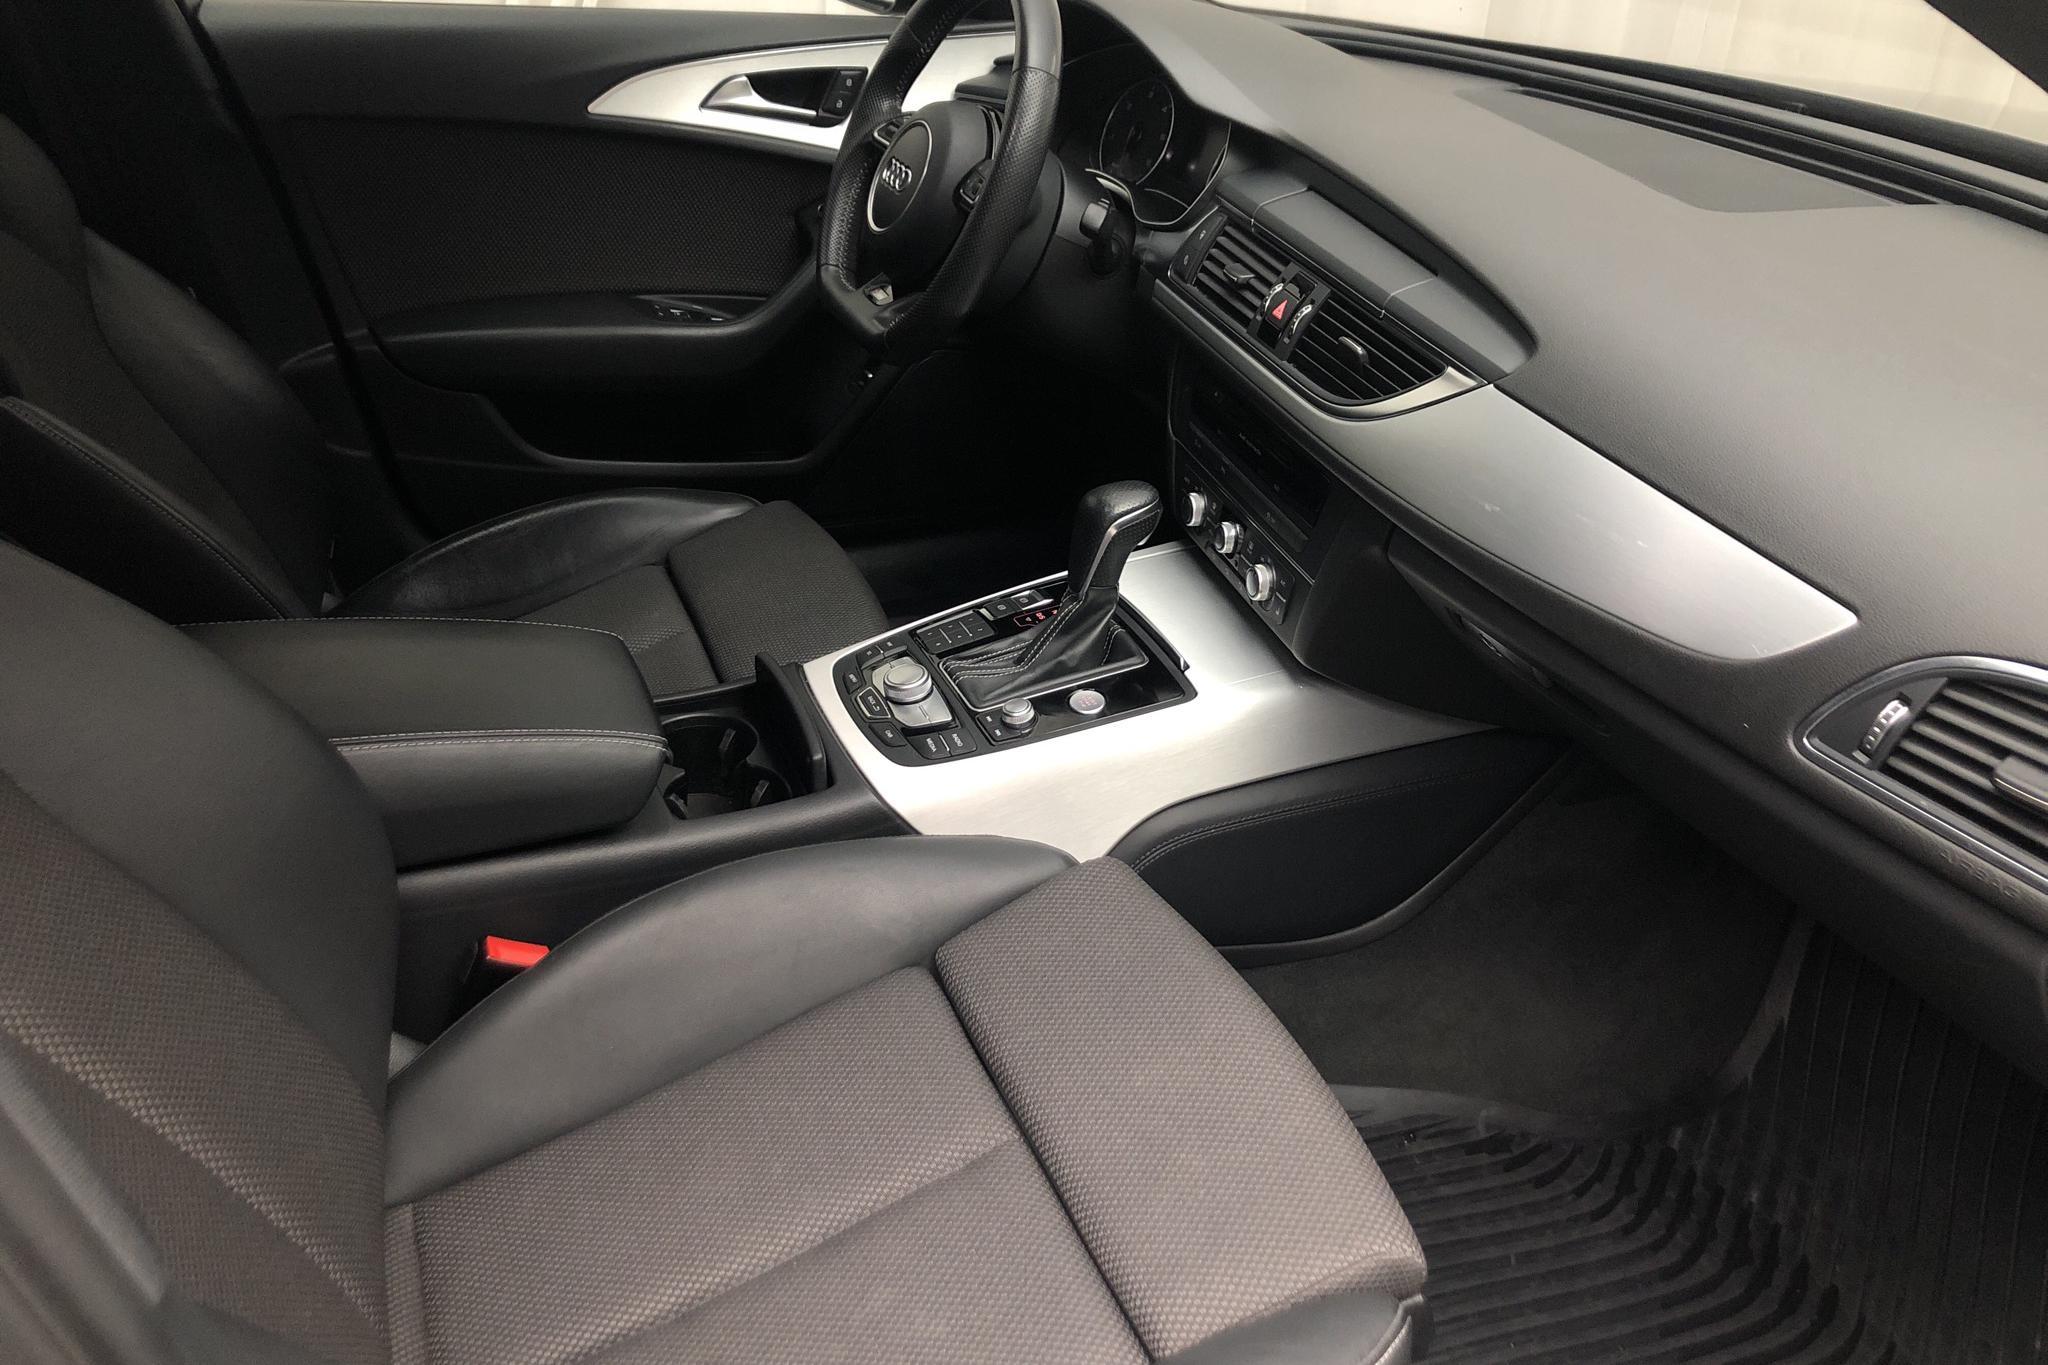 Audi A6 2.0 TDI Avant (190hk) - 134 690 km - Automatic - black - 2018